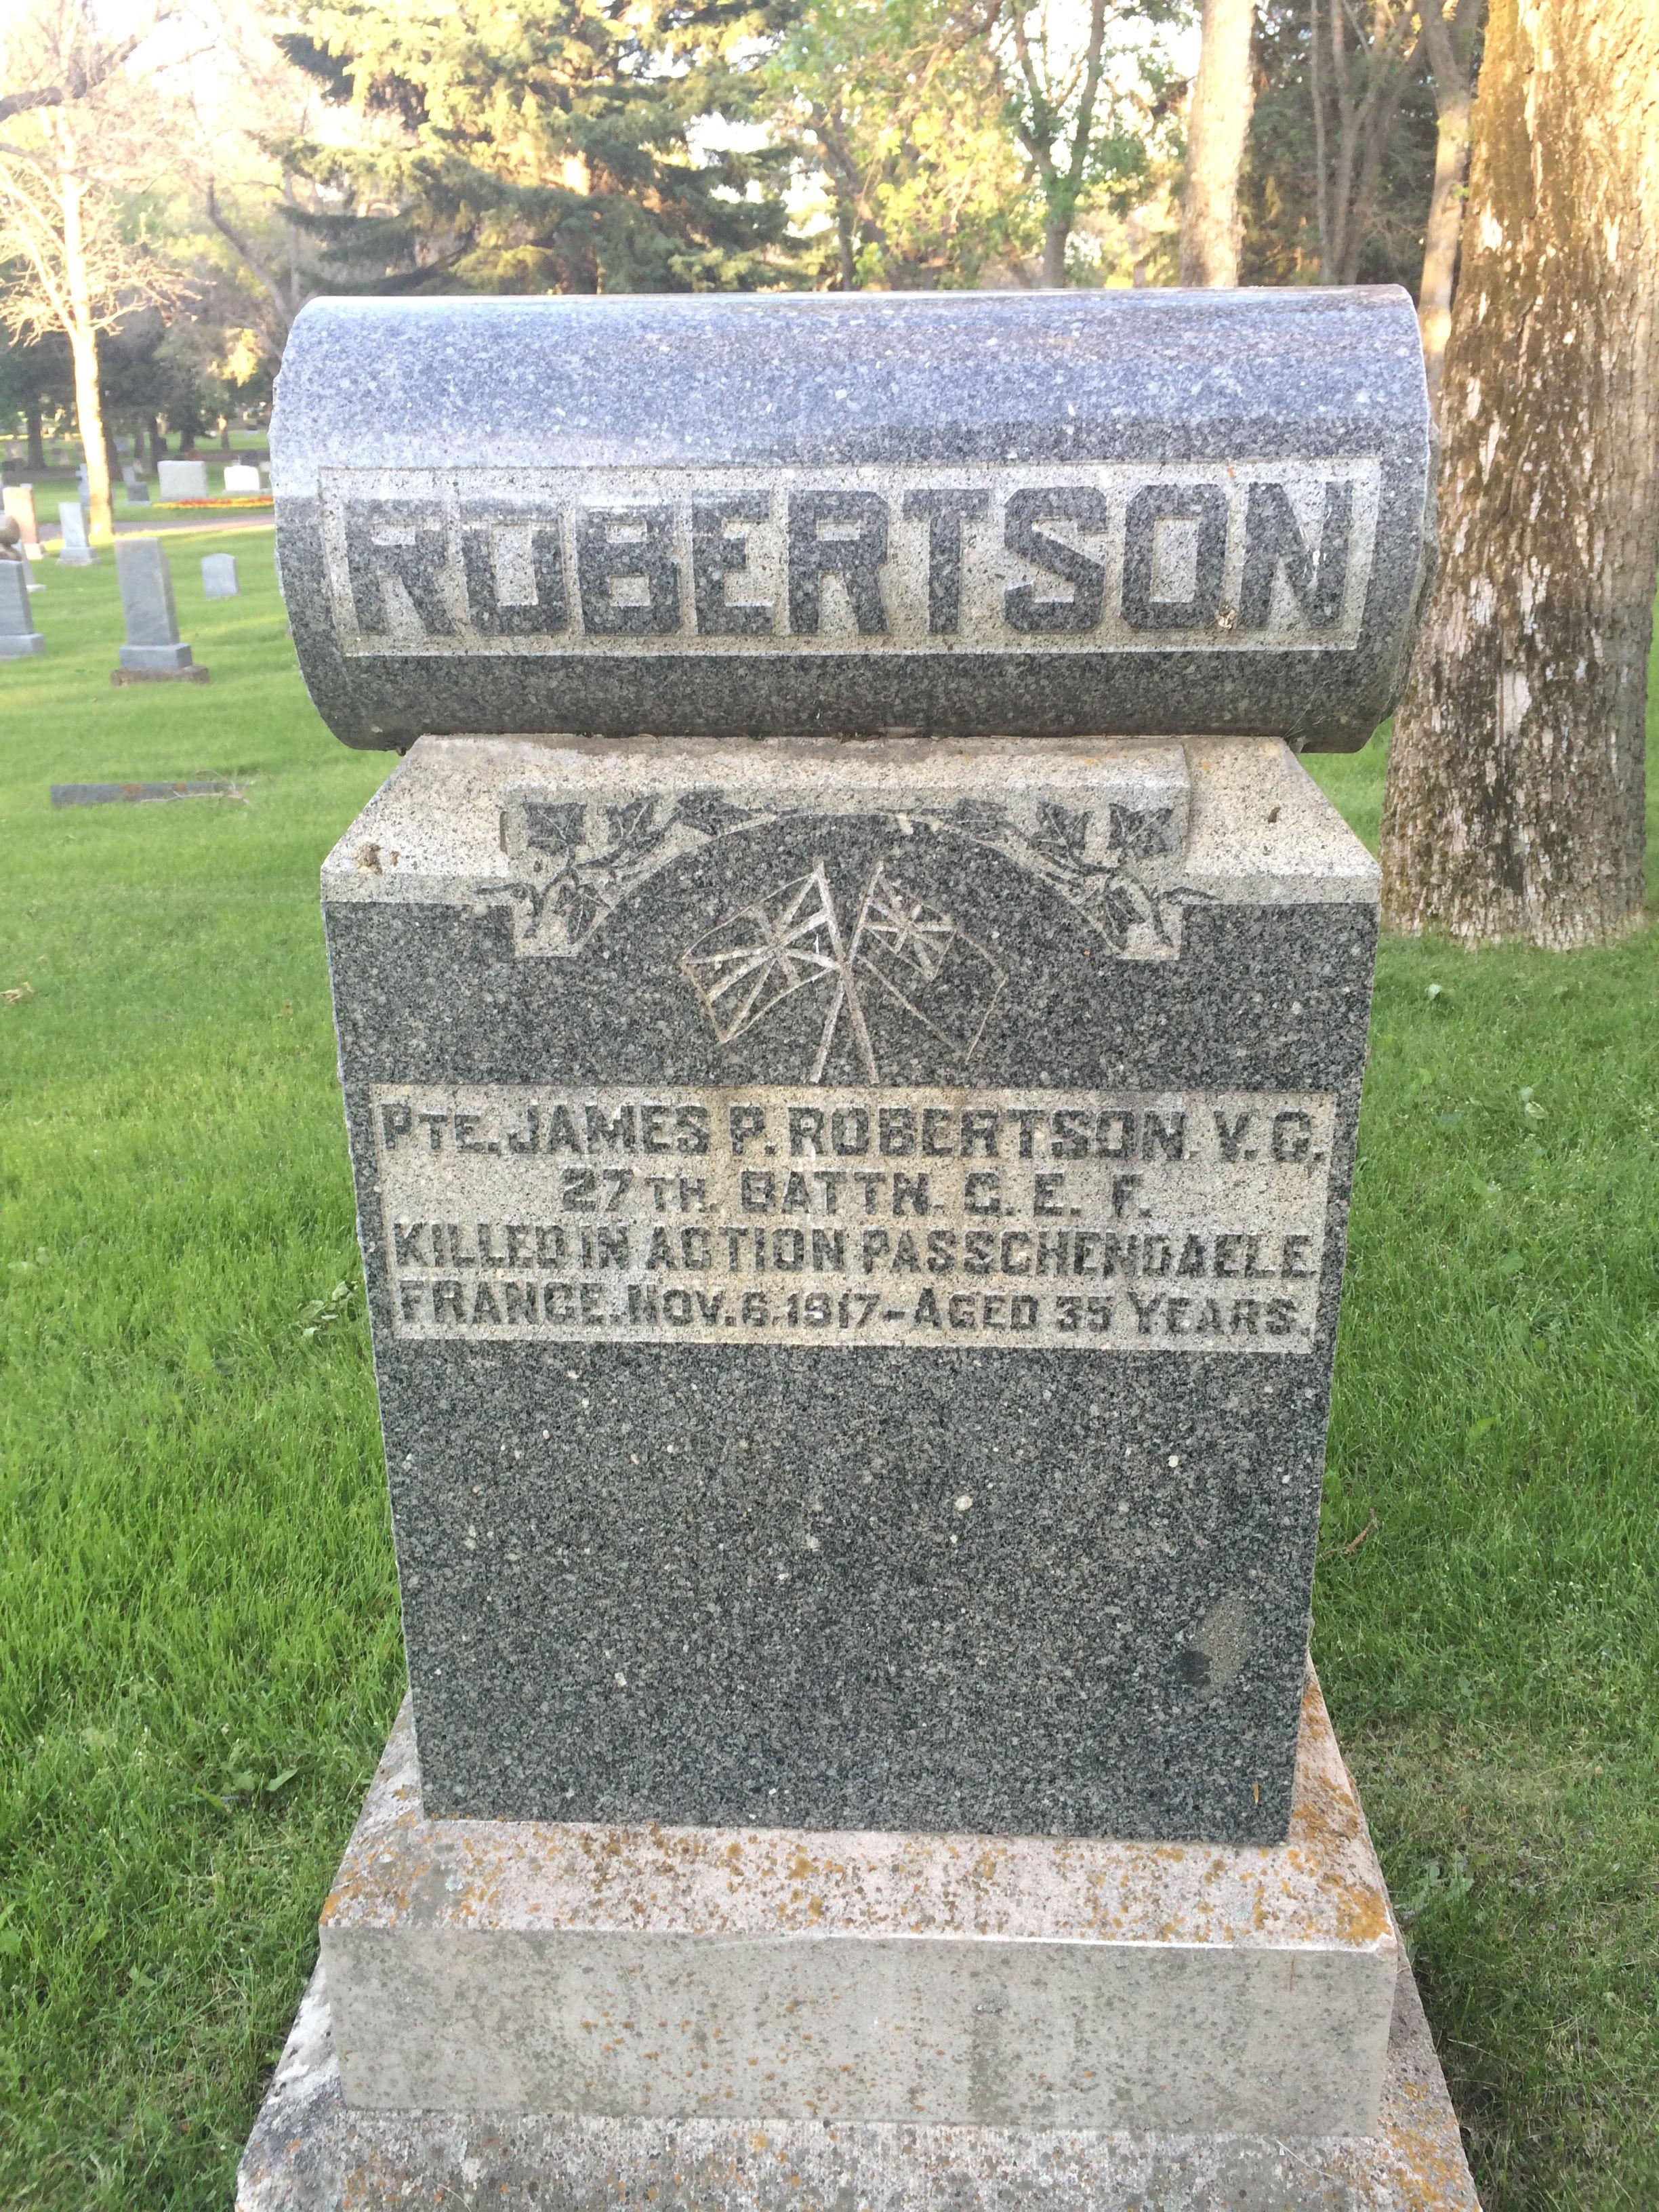 Family gravemarker– Commemorative headstone in MEDICINE HAT (HILLSIDE) CEMETERY, Alberta